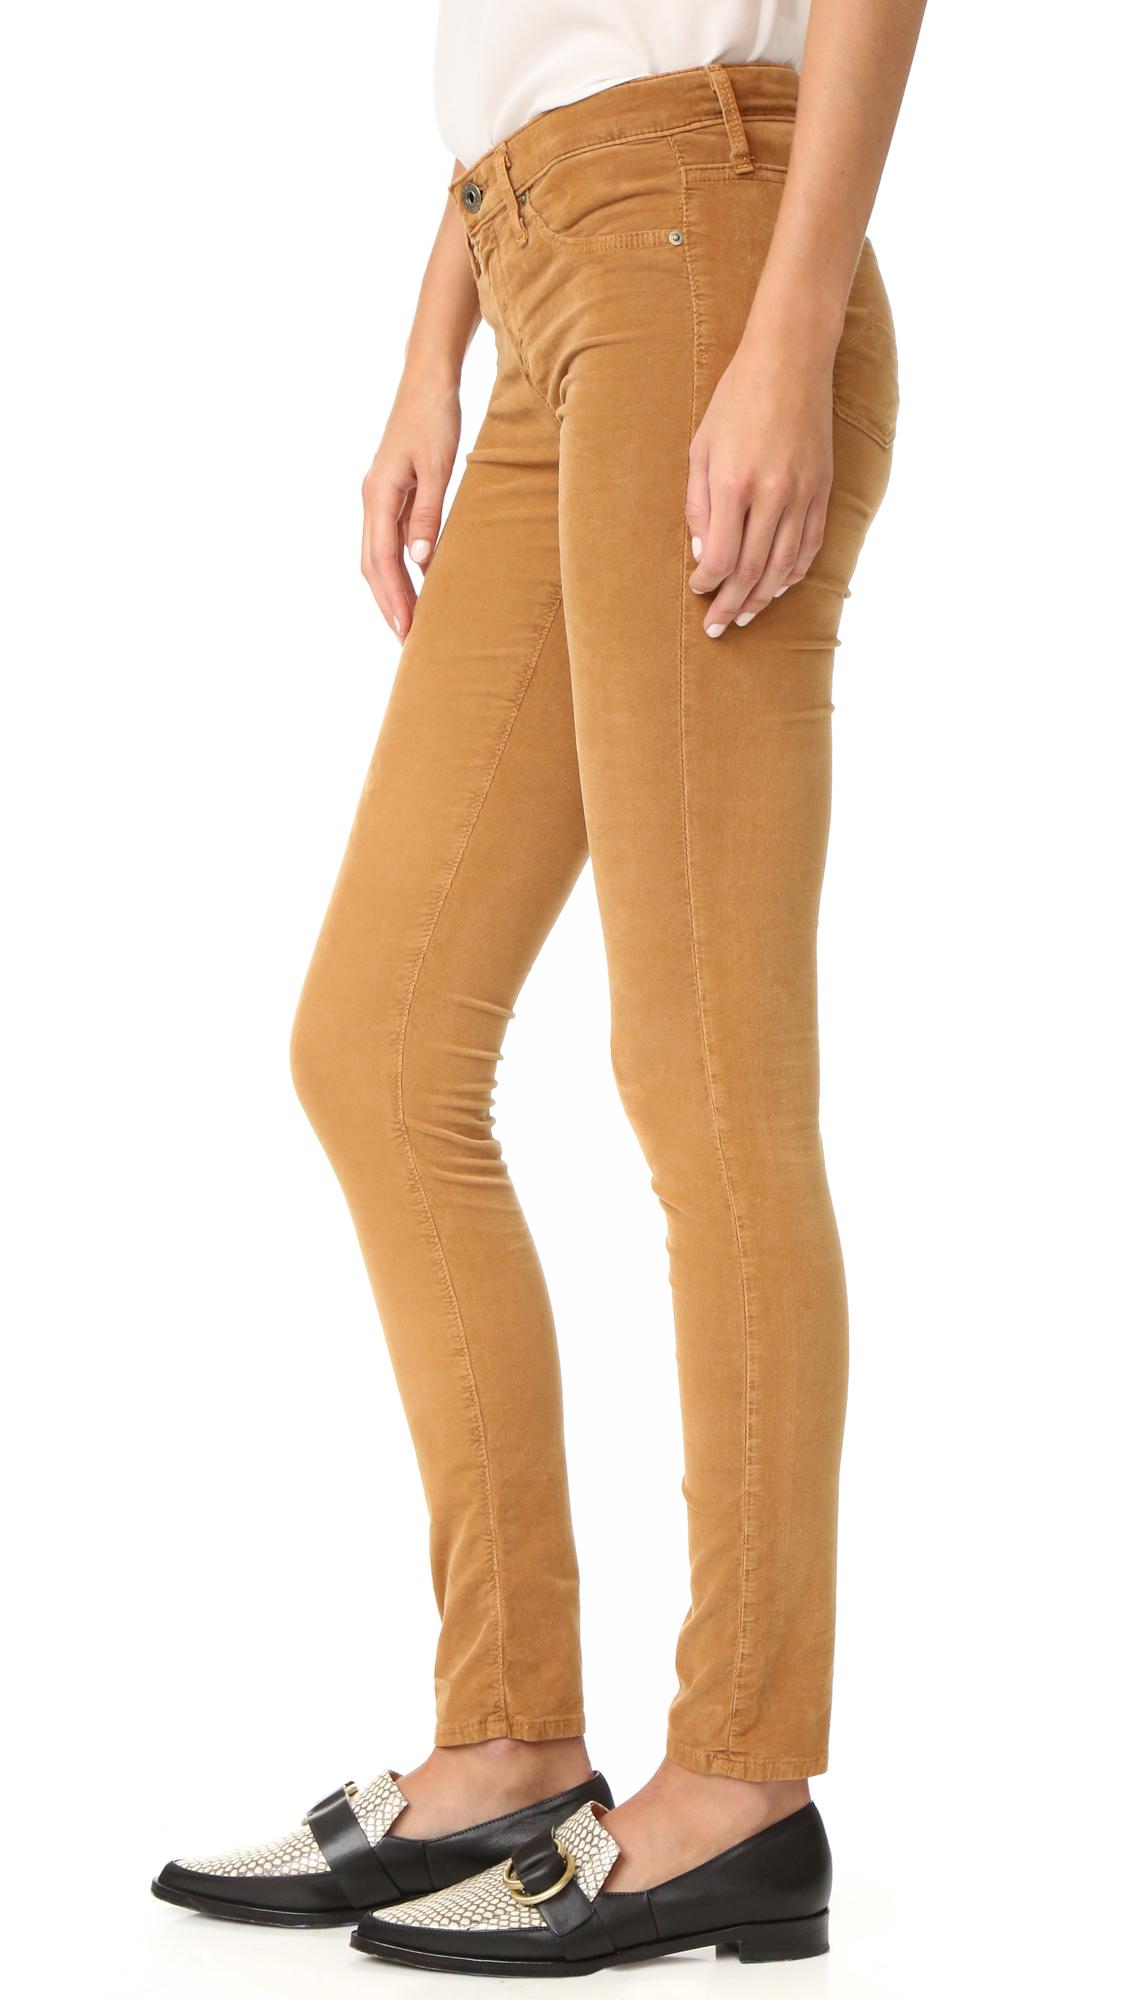 Ag jeans The Super Skinny Legging Jeans in Black